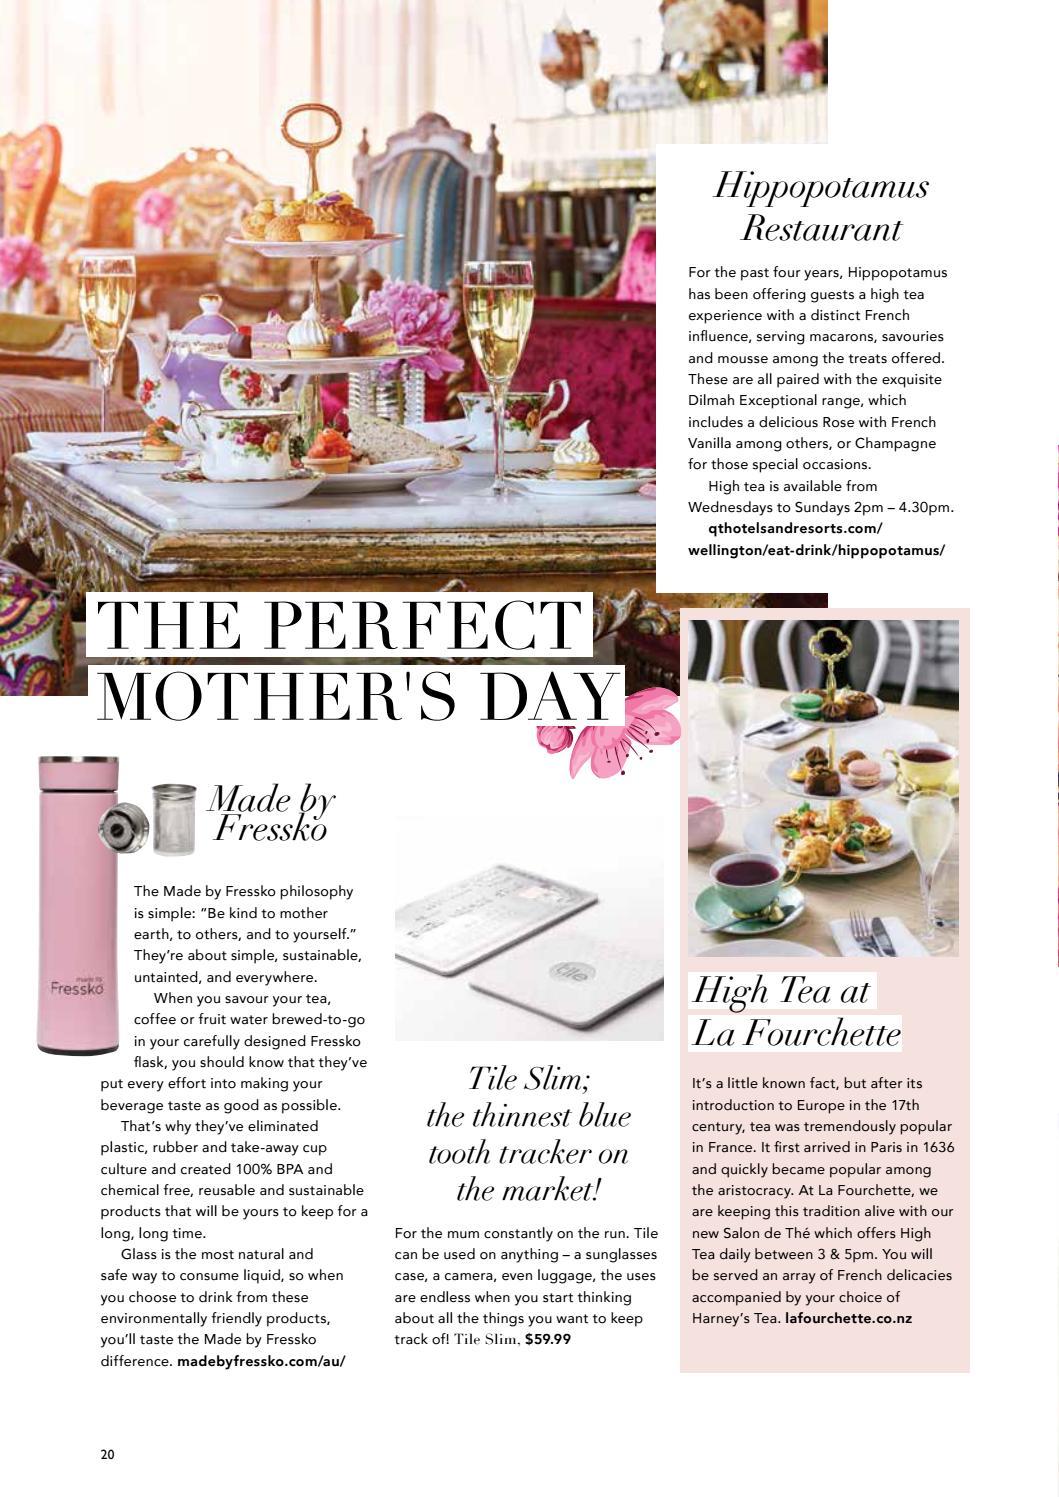 Eye Magazine Issue 73 2017 By Multi Media Magazines Issuu Dilmah Rose With French Vanilla